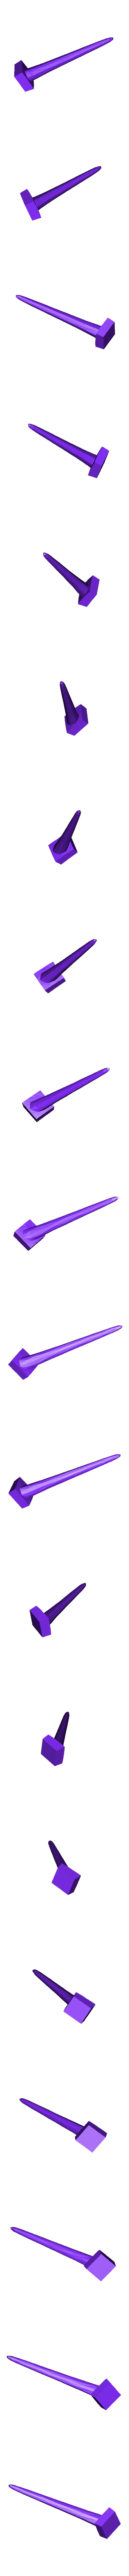 Meowth_whisker_2.obj Download free OBJ file Life-Sized Meowth • 3D print model, JayOmega